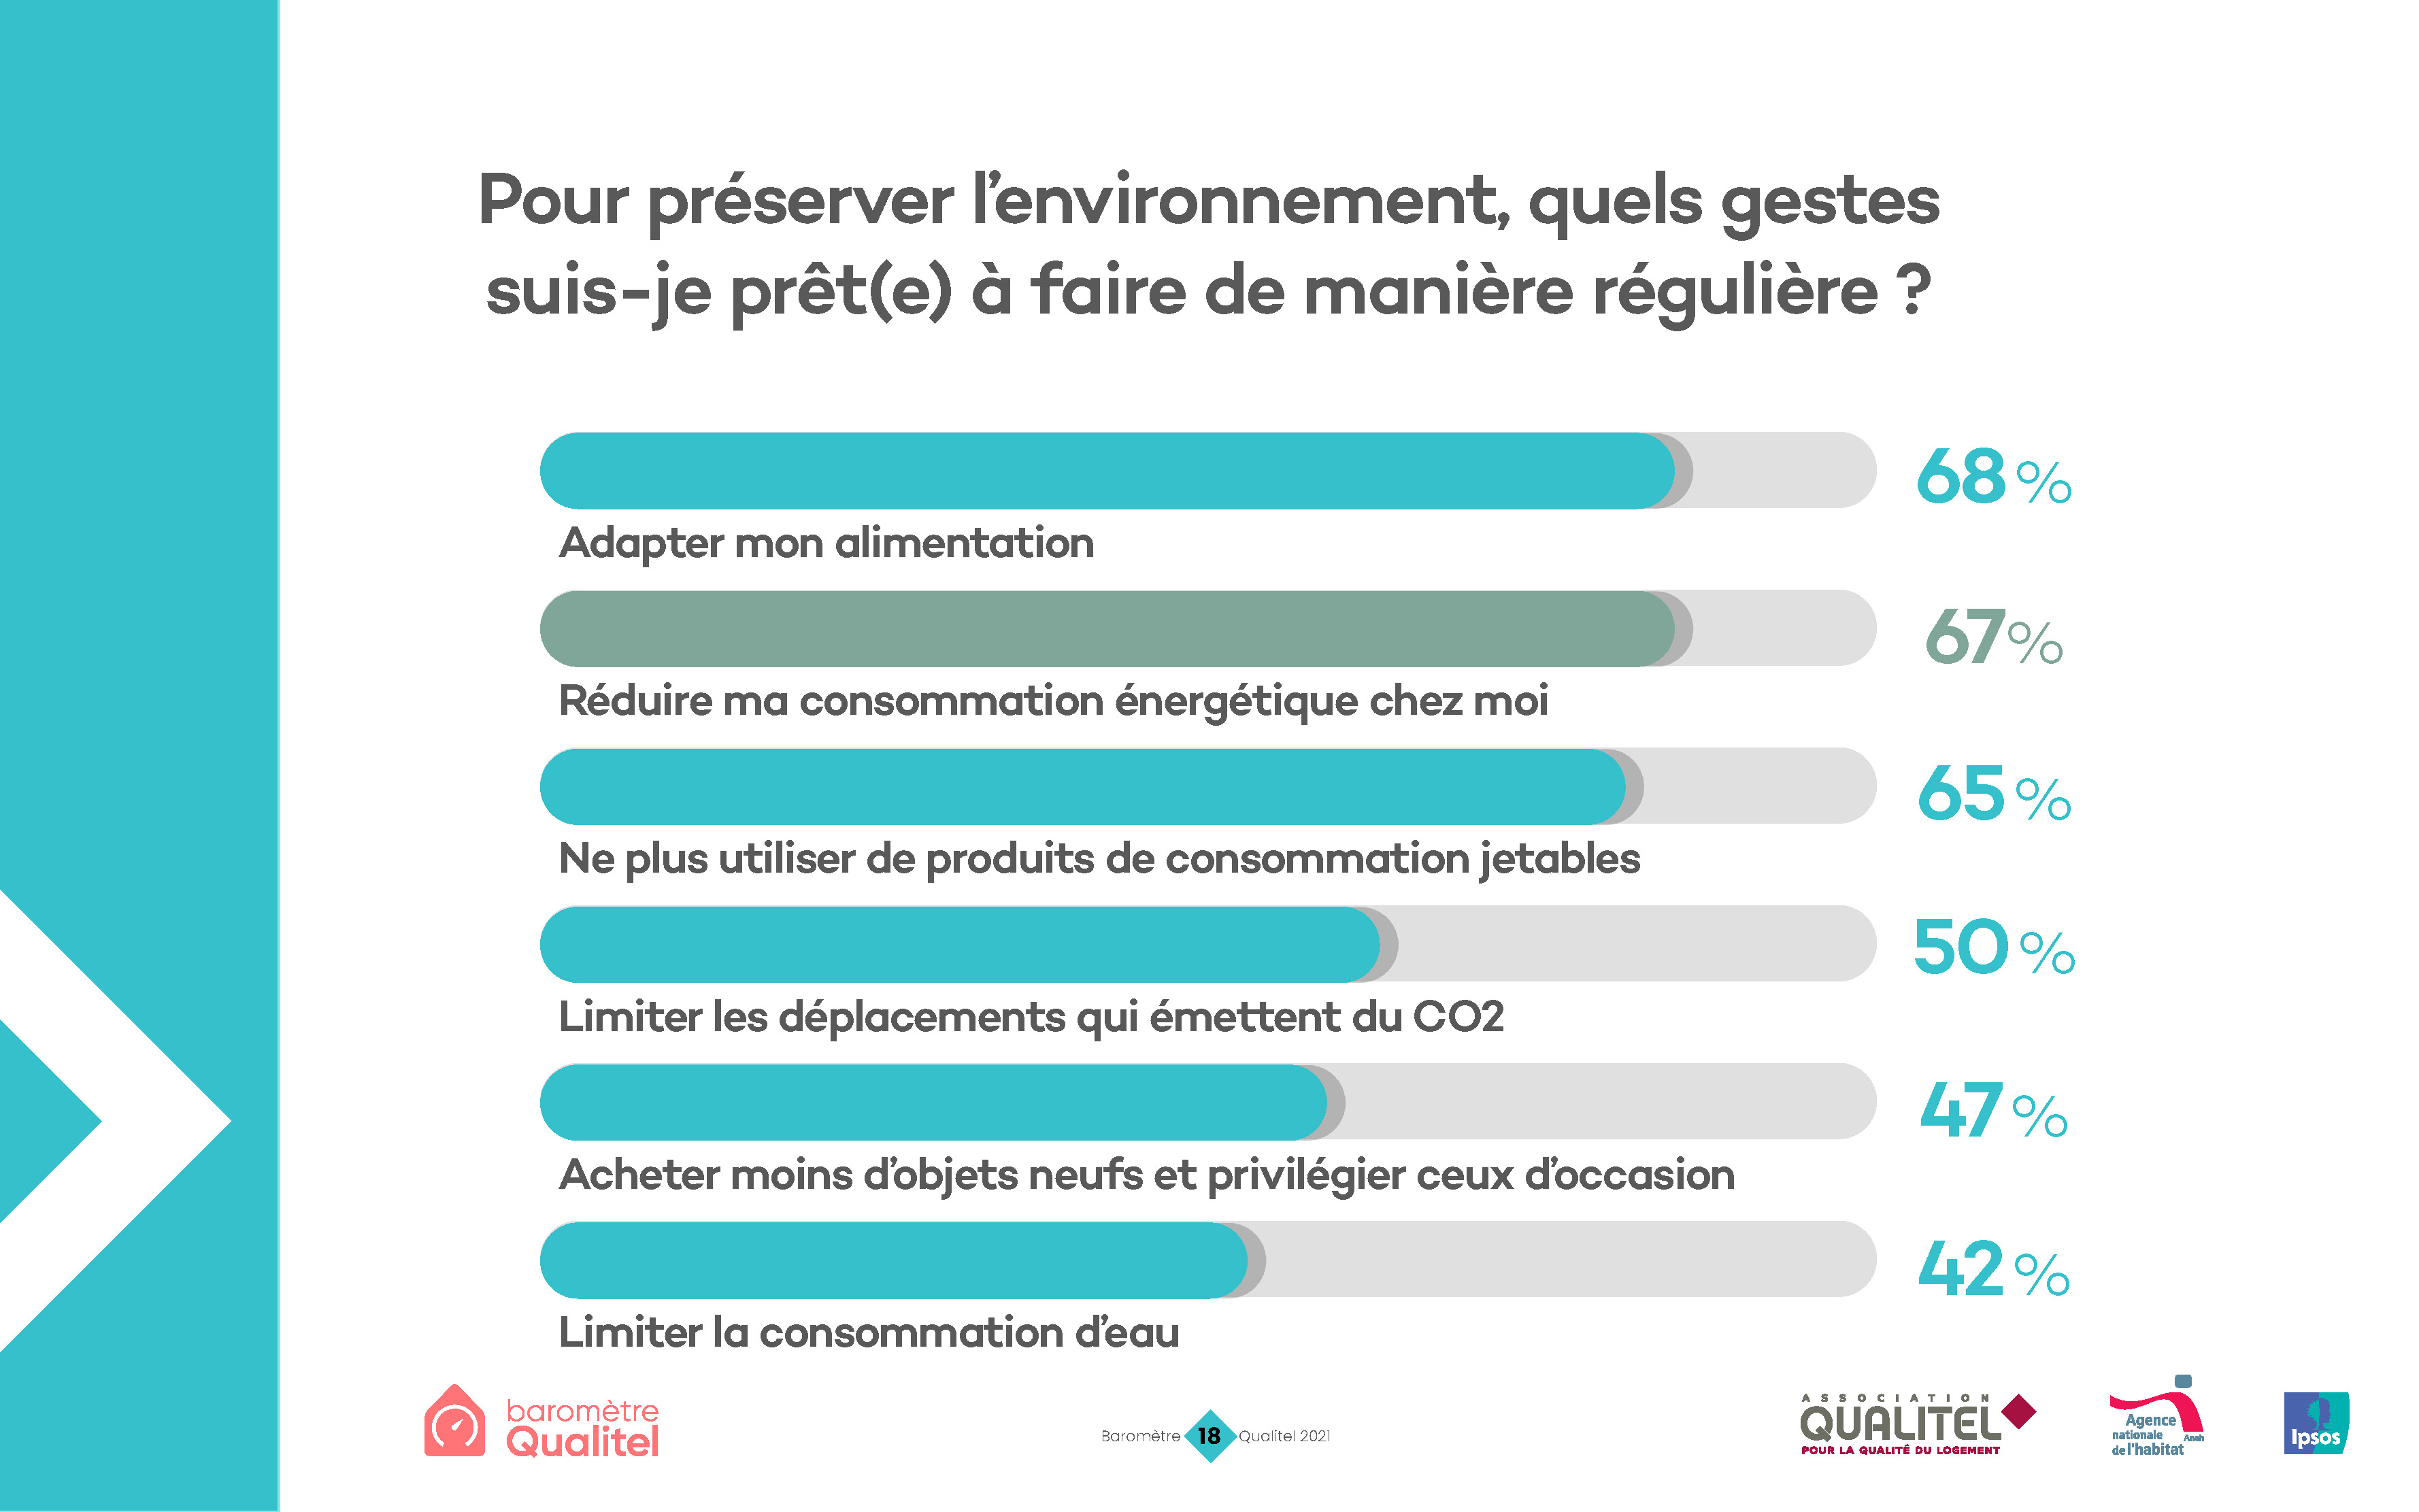 Source : Baromètre Qualitel 2021